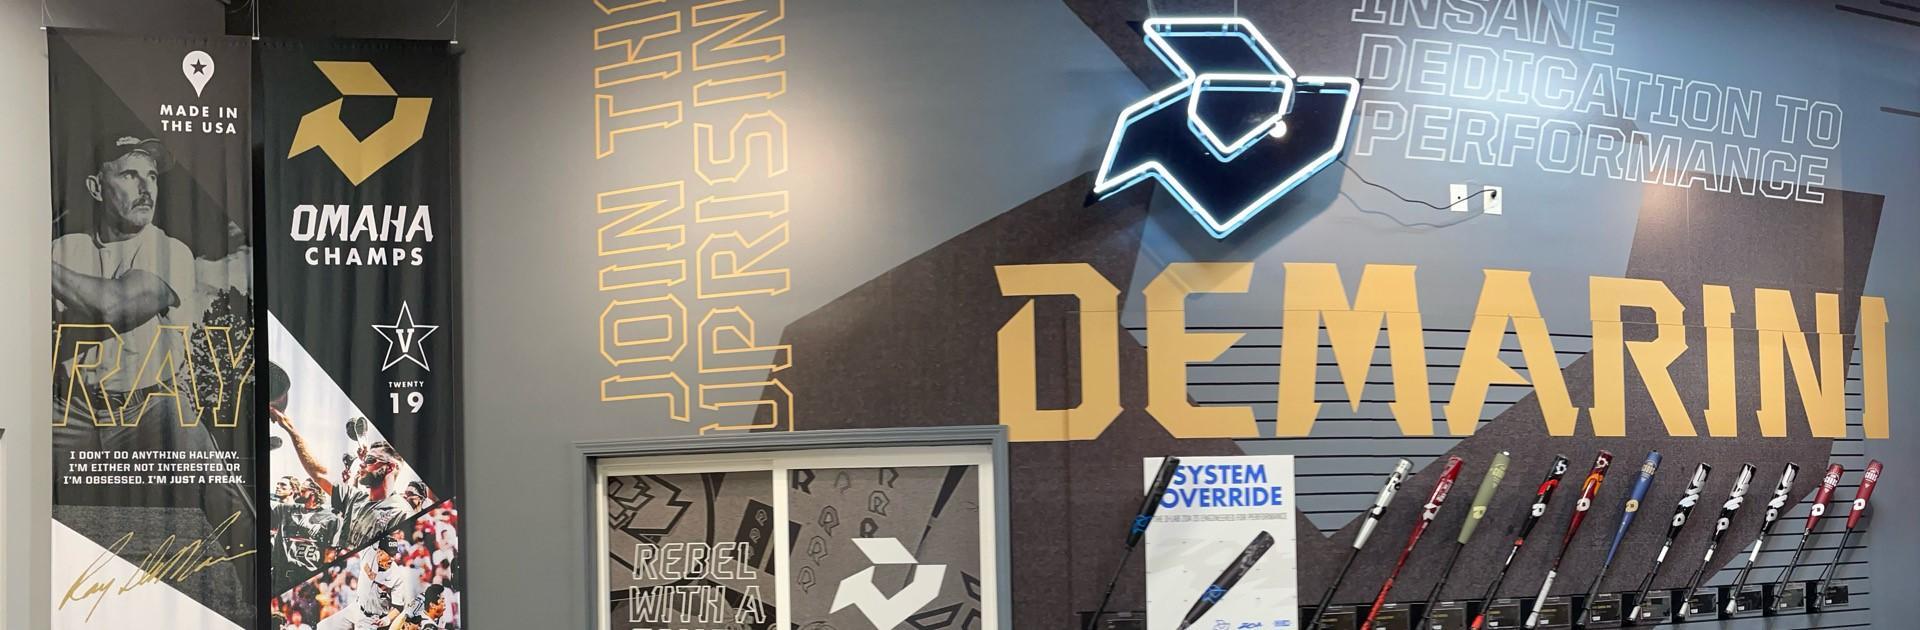 2022-DeMarini-Logo-Rayzr'D-Omaha-Experience-The-Goods-Voodoo-One